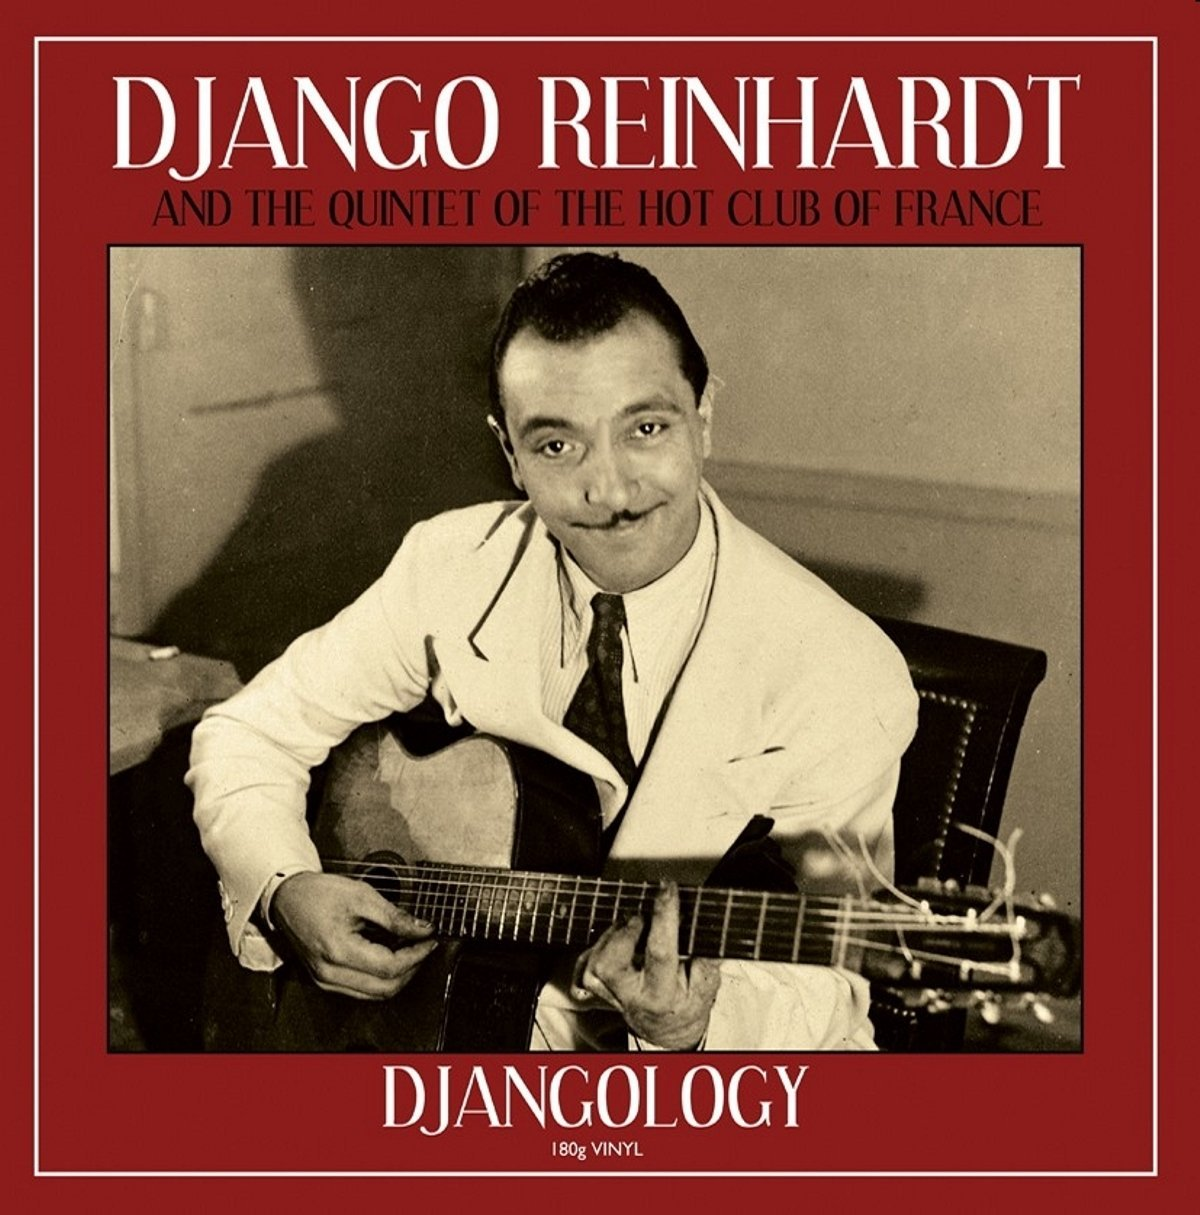 Джанго Рейнхардт,The Quintet Of The Hot Club Of France Django Reinhardt And The Quintet Of The Hot Club Of France. Djangology (LP) the chico hamilton quintet the chico hamilton quintet gongs east